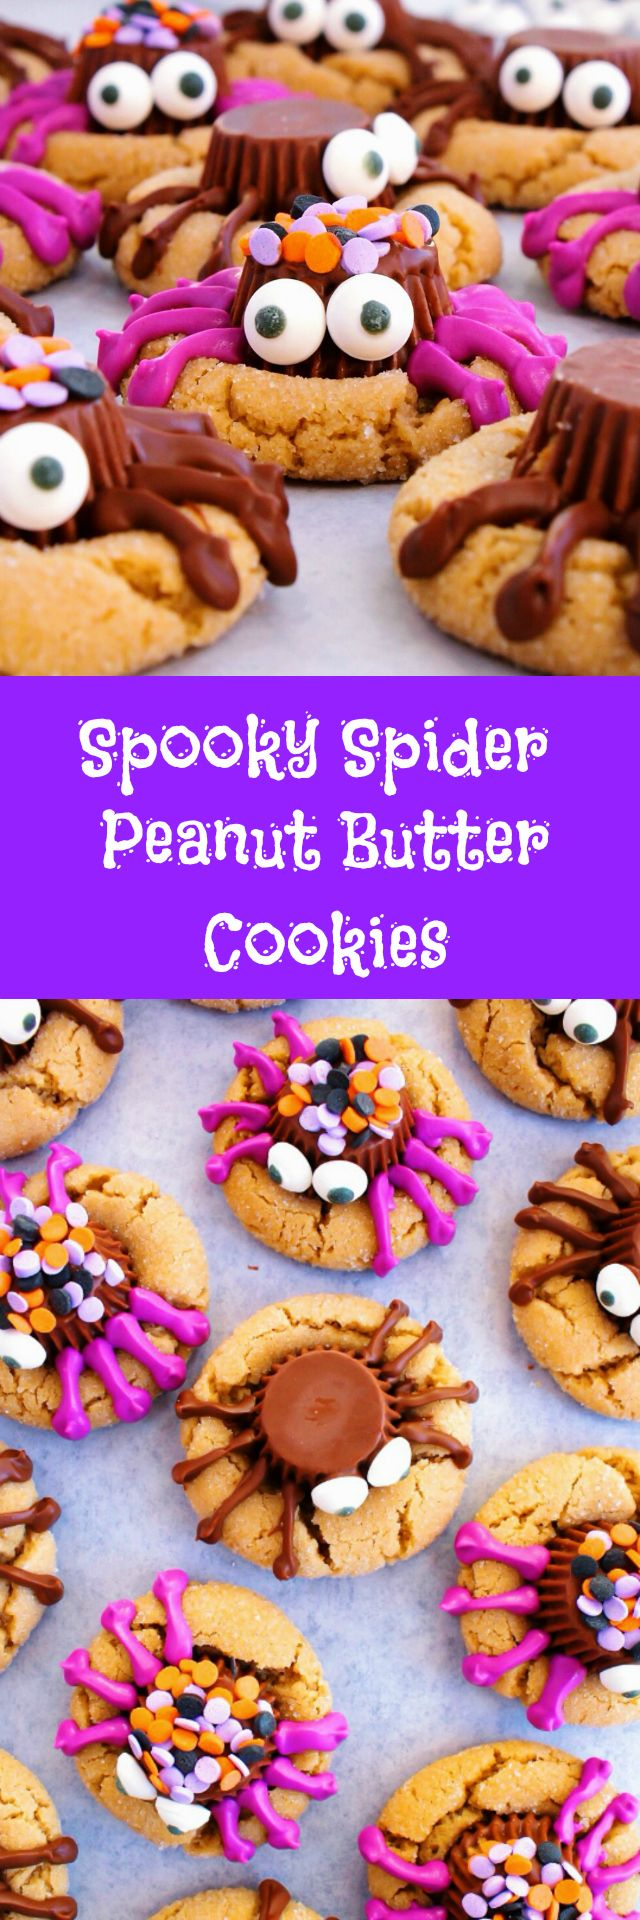 Spooky Spider Peanut Butter Cookies - Classic peanut ...